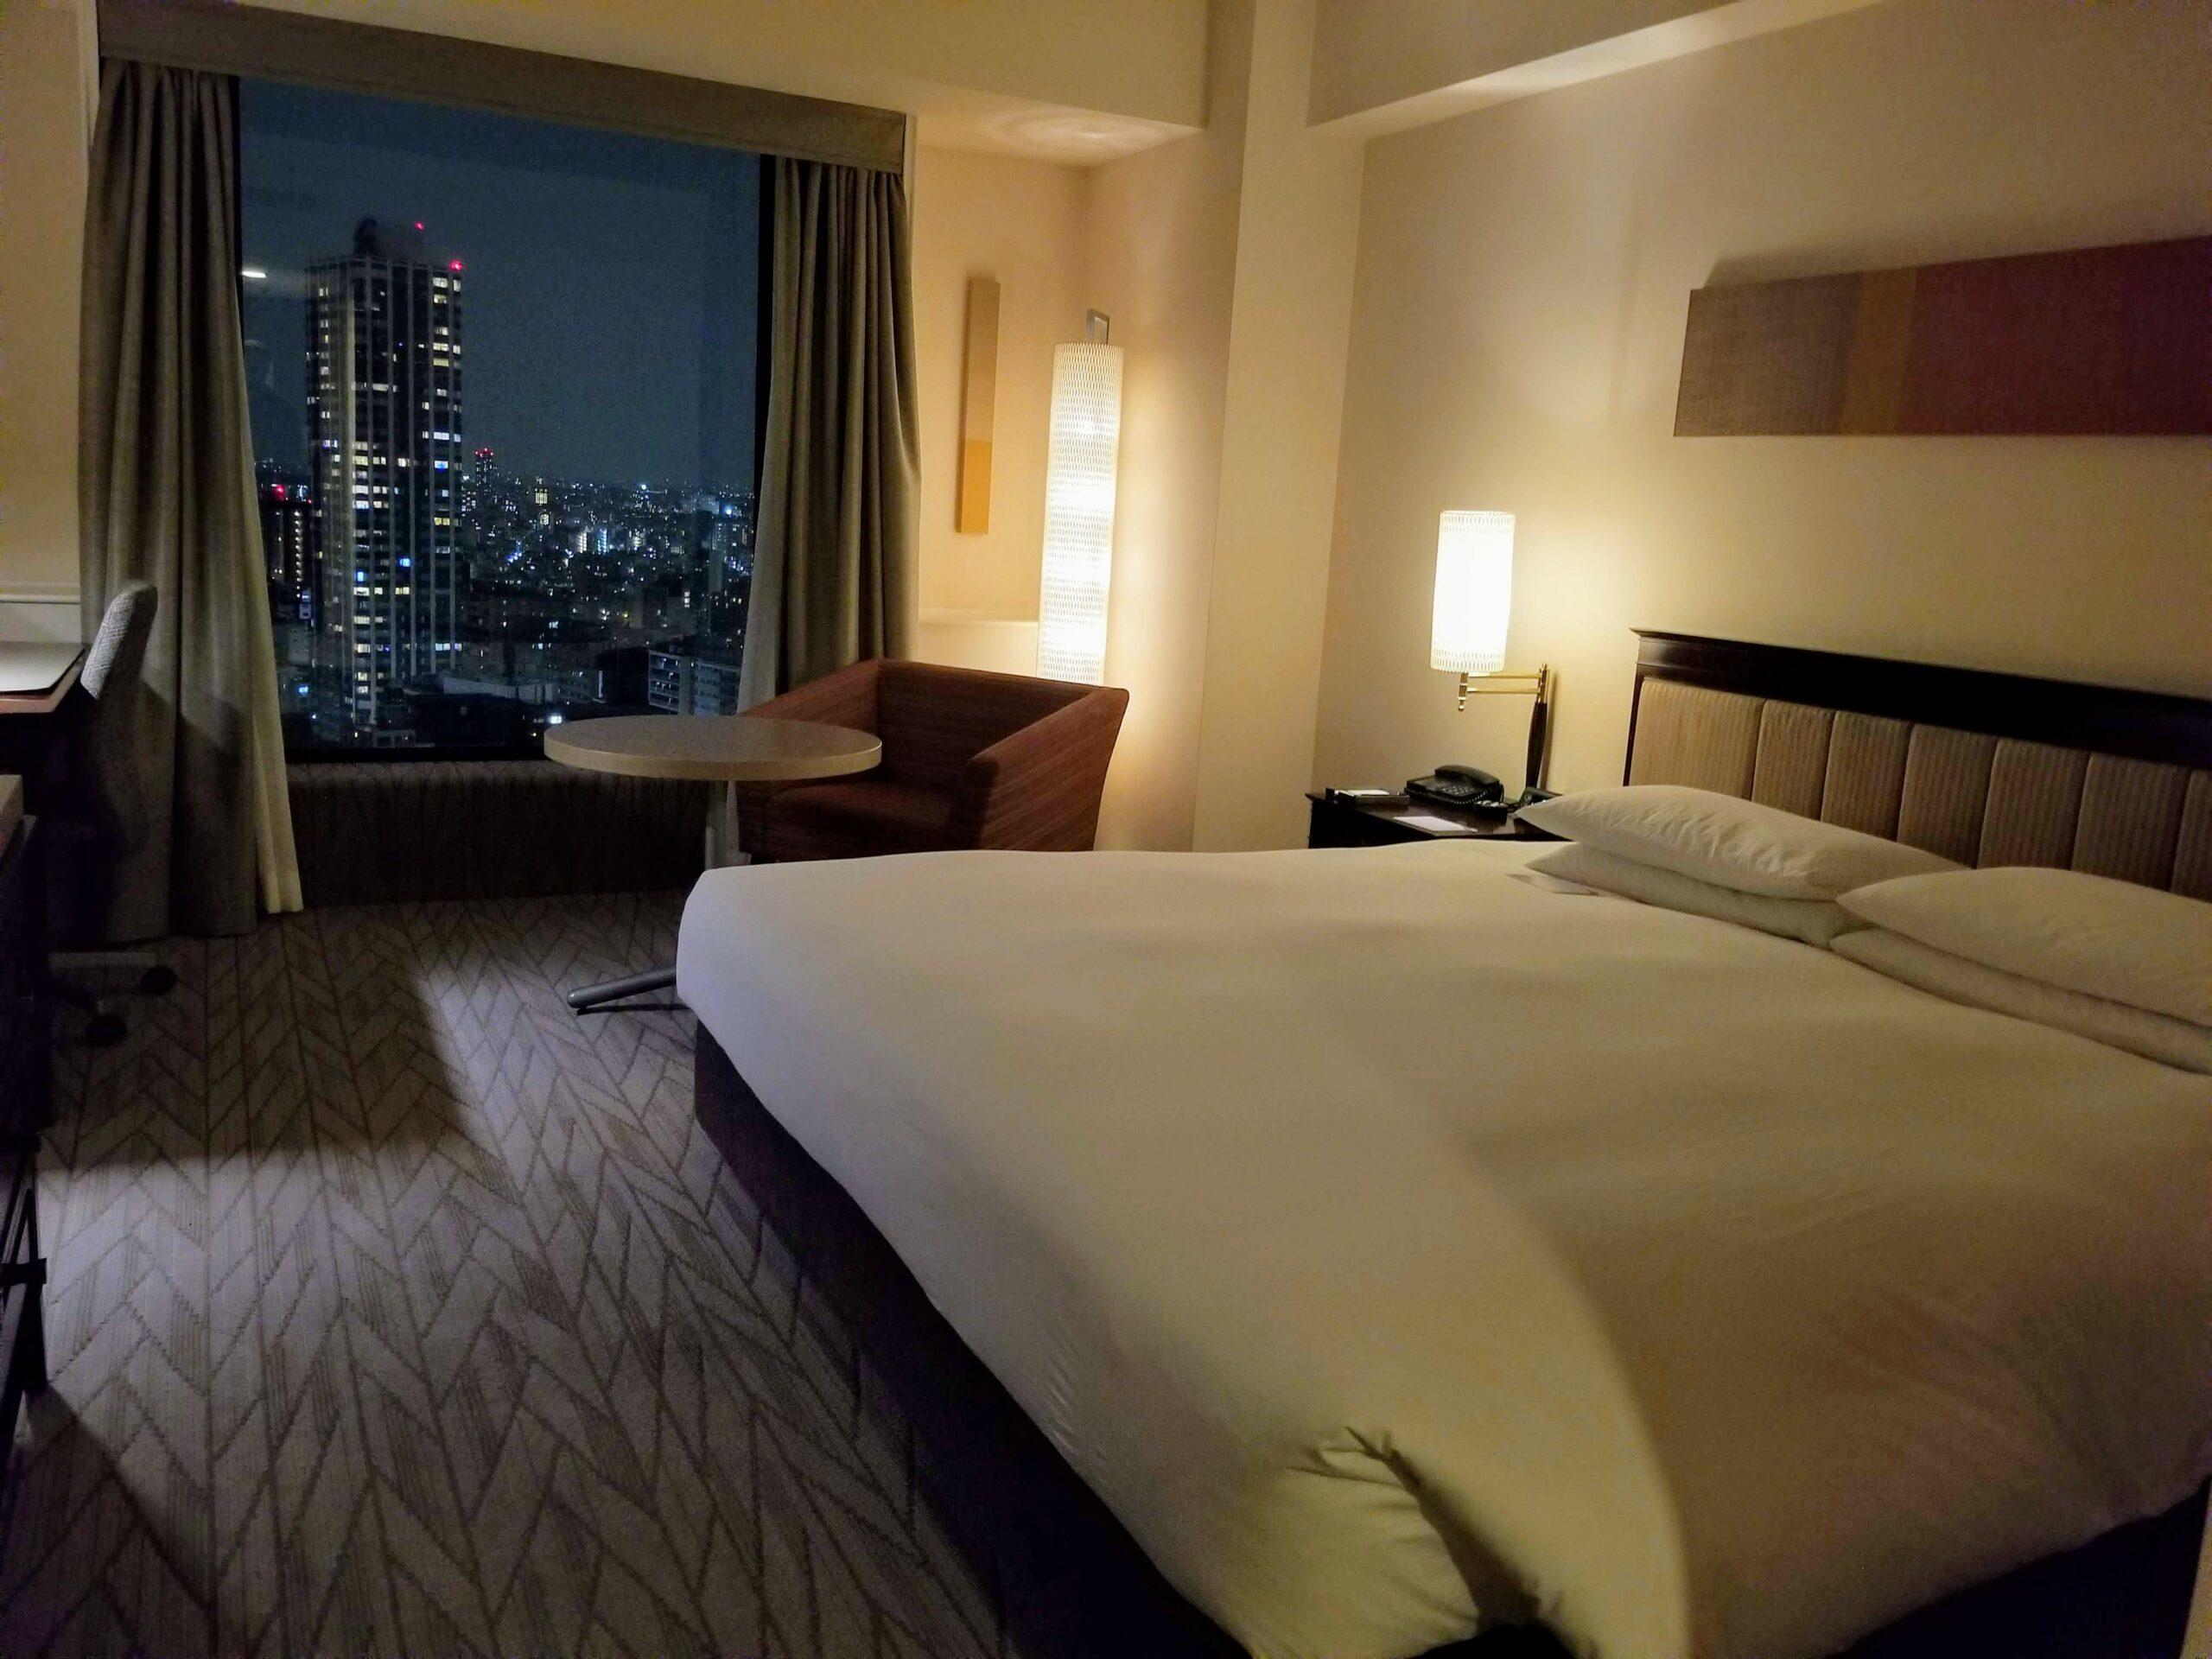 Our room at the Hyatt Regency Tokyo